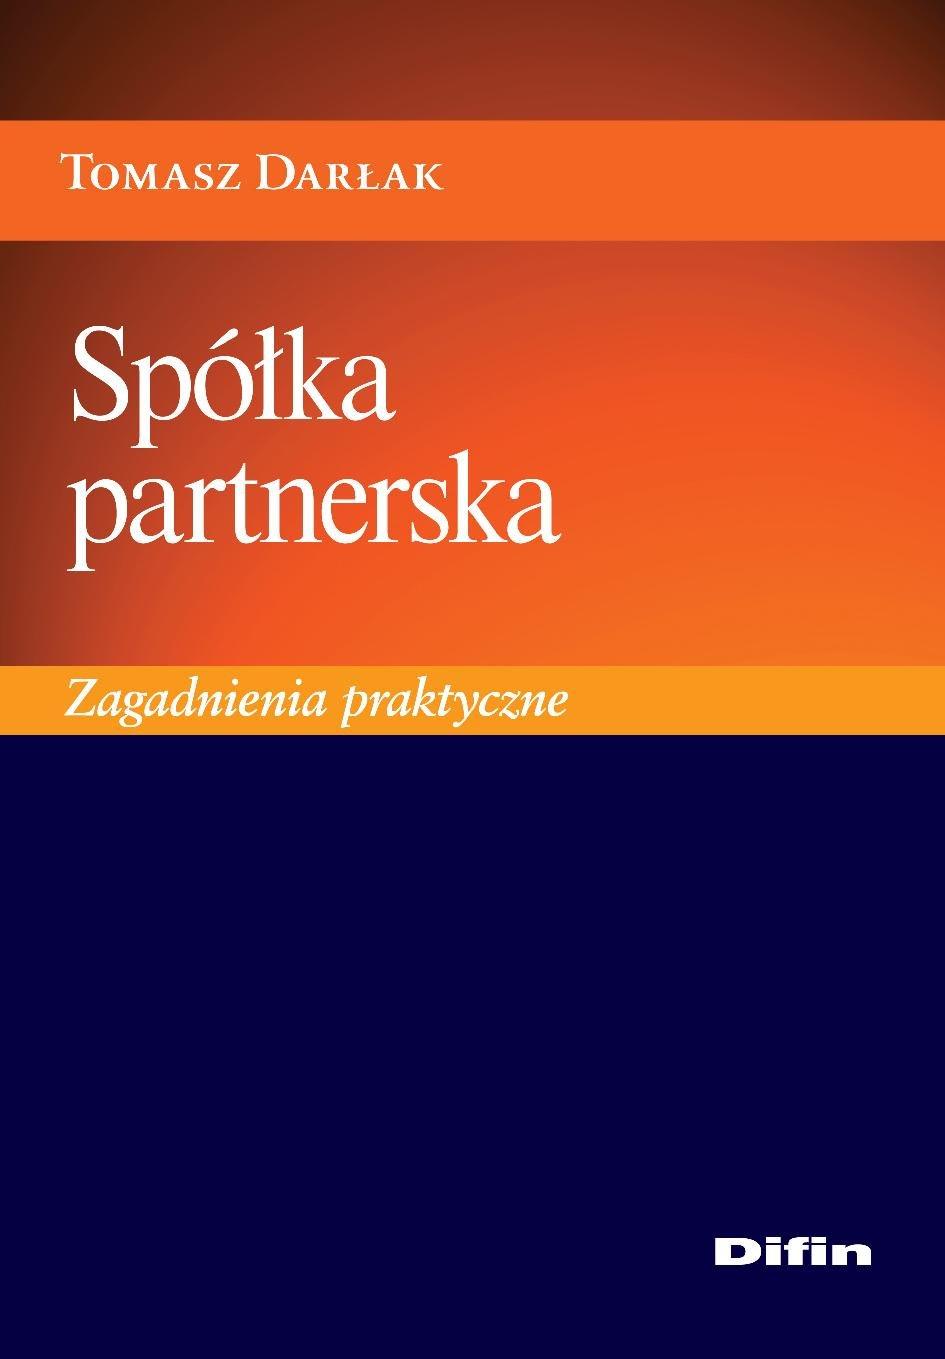 Spółka partnerska. Zagadnienia praktyczne - Ebook (Książka PDF) do pobrania w formacie PDF